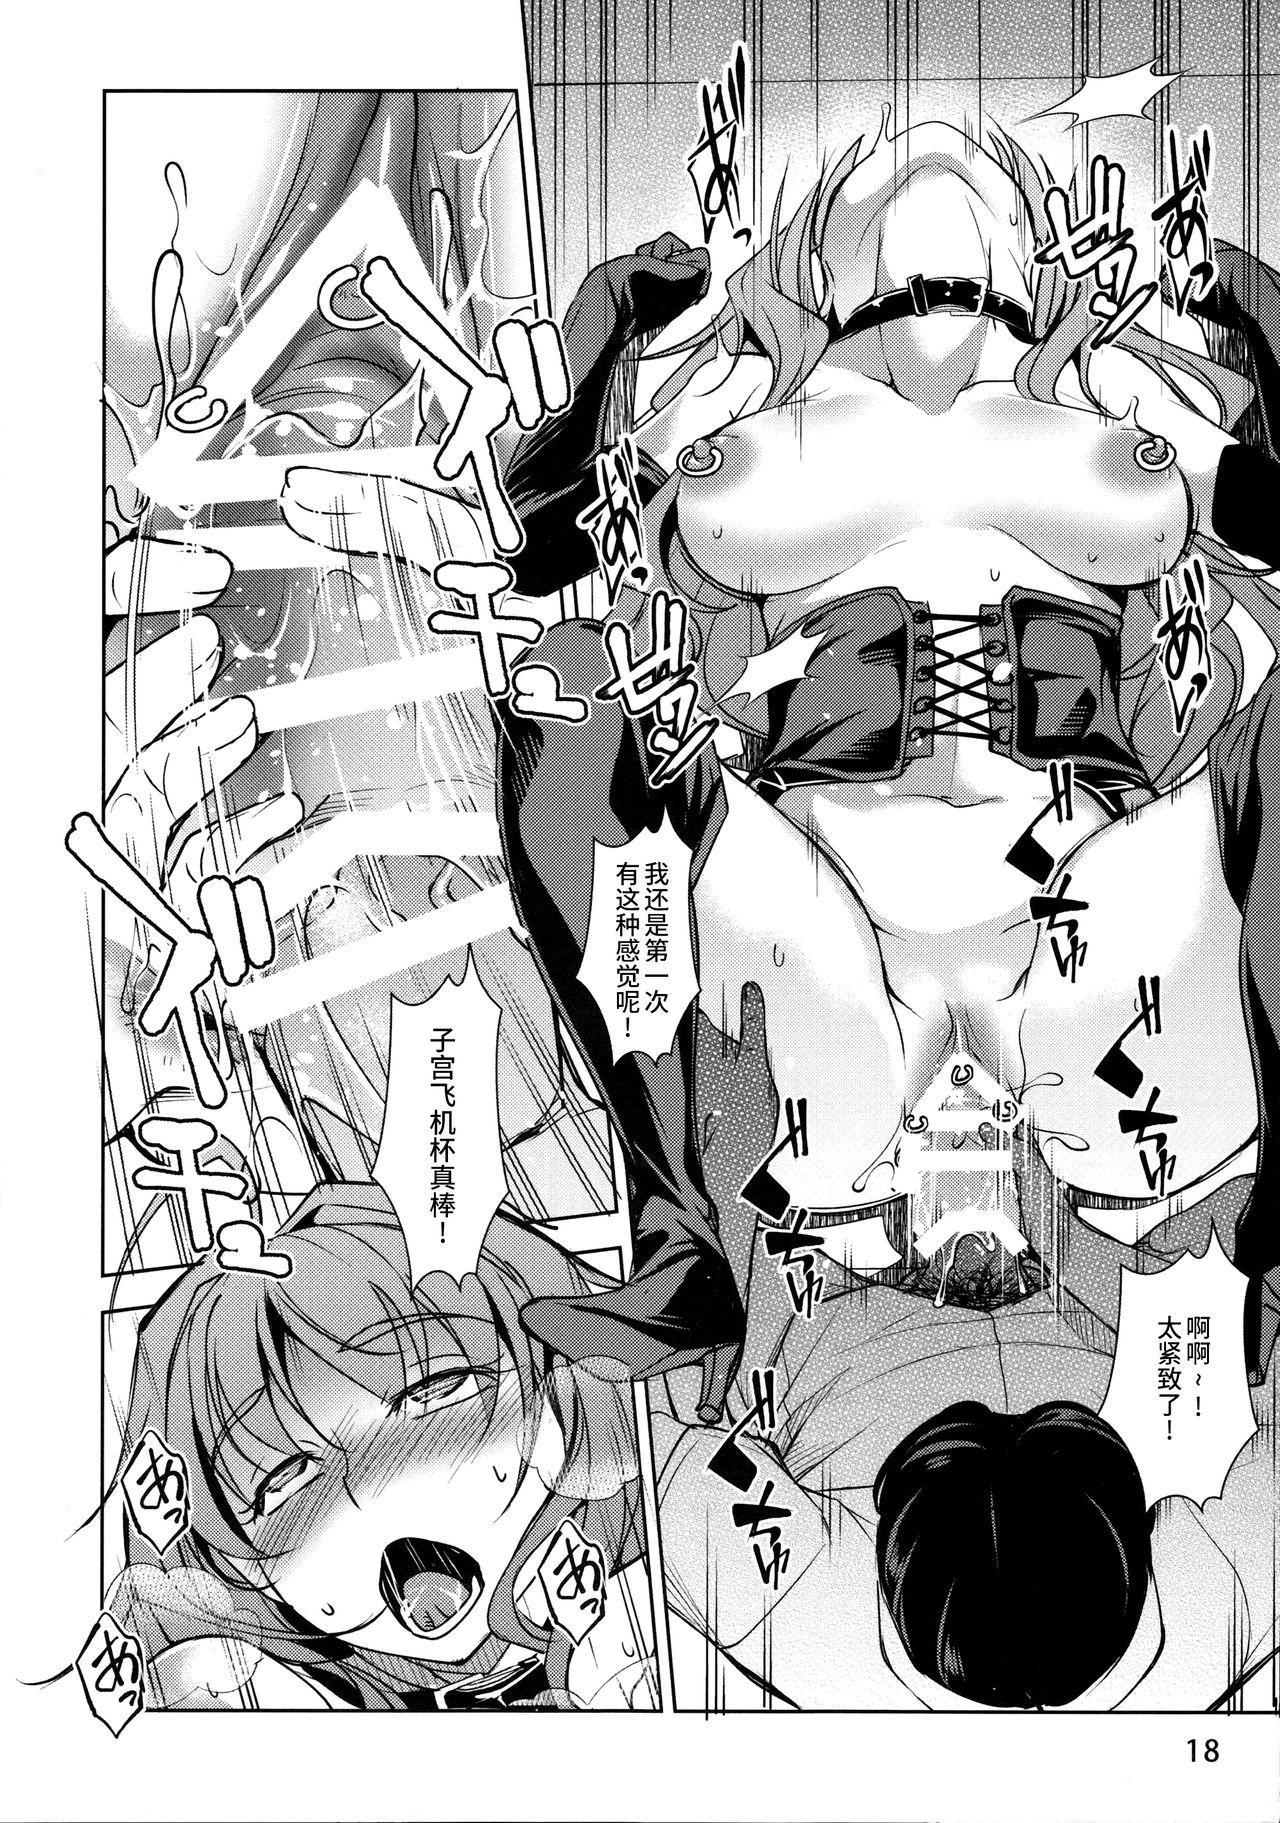 INDEXGIRLS 11 Index-chan no hageshii Mousou Yuukii 19